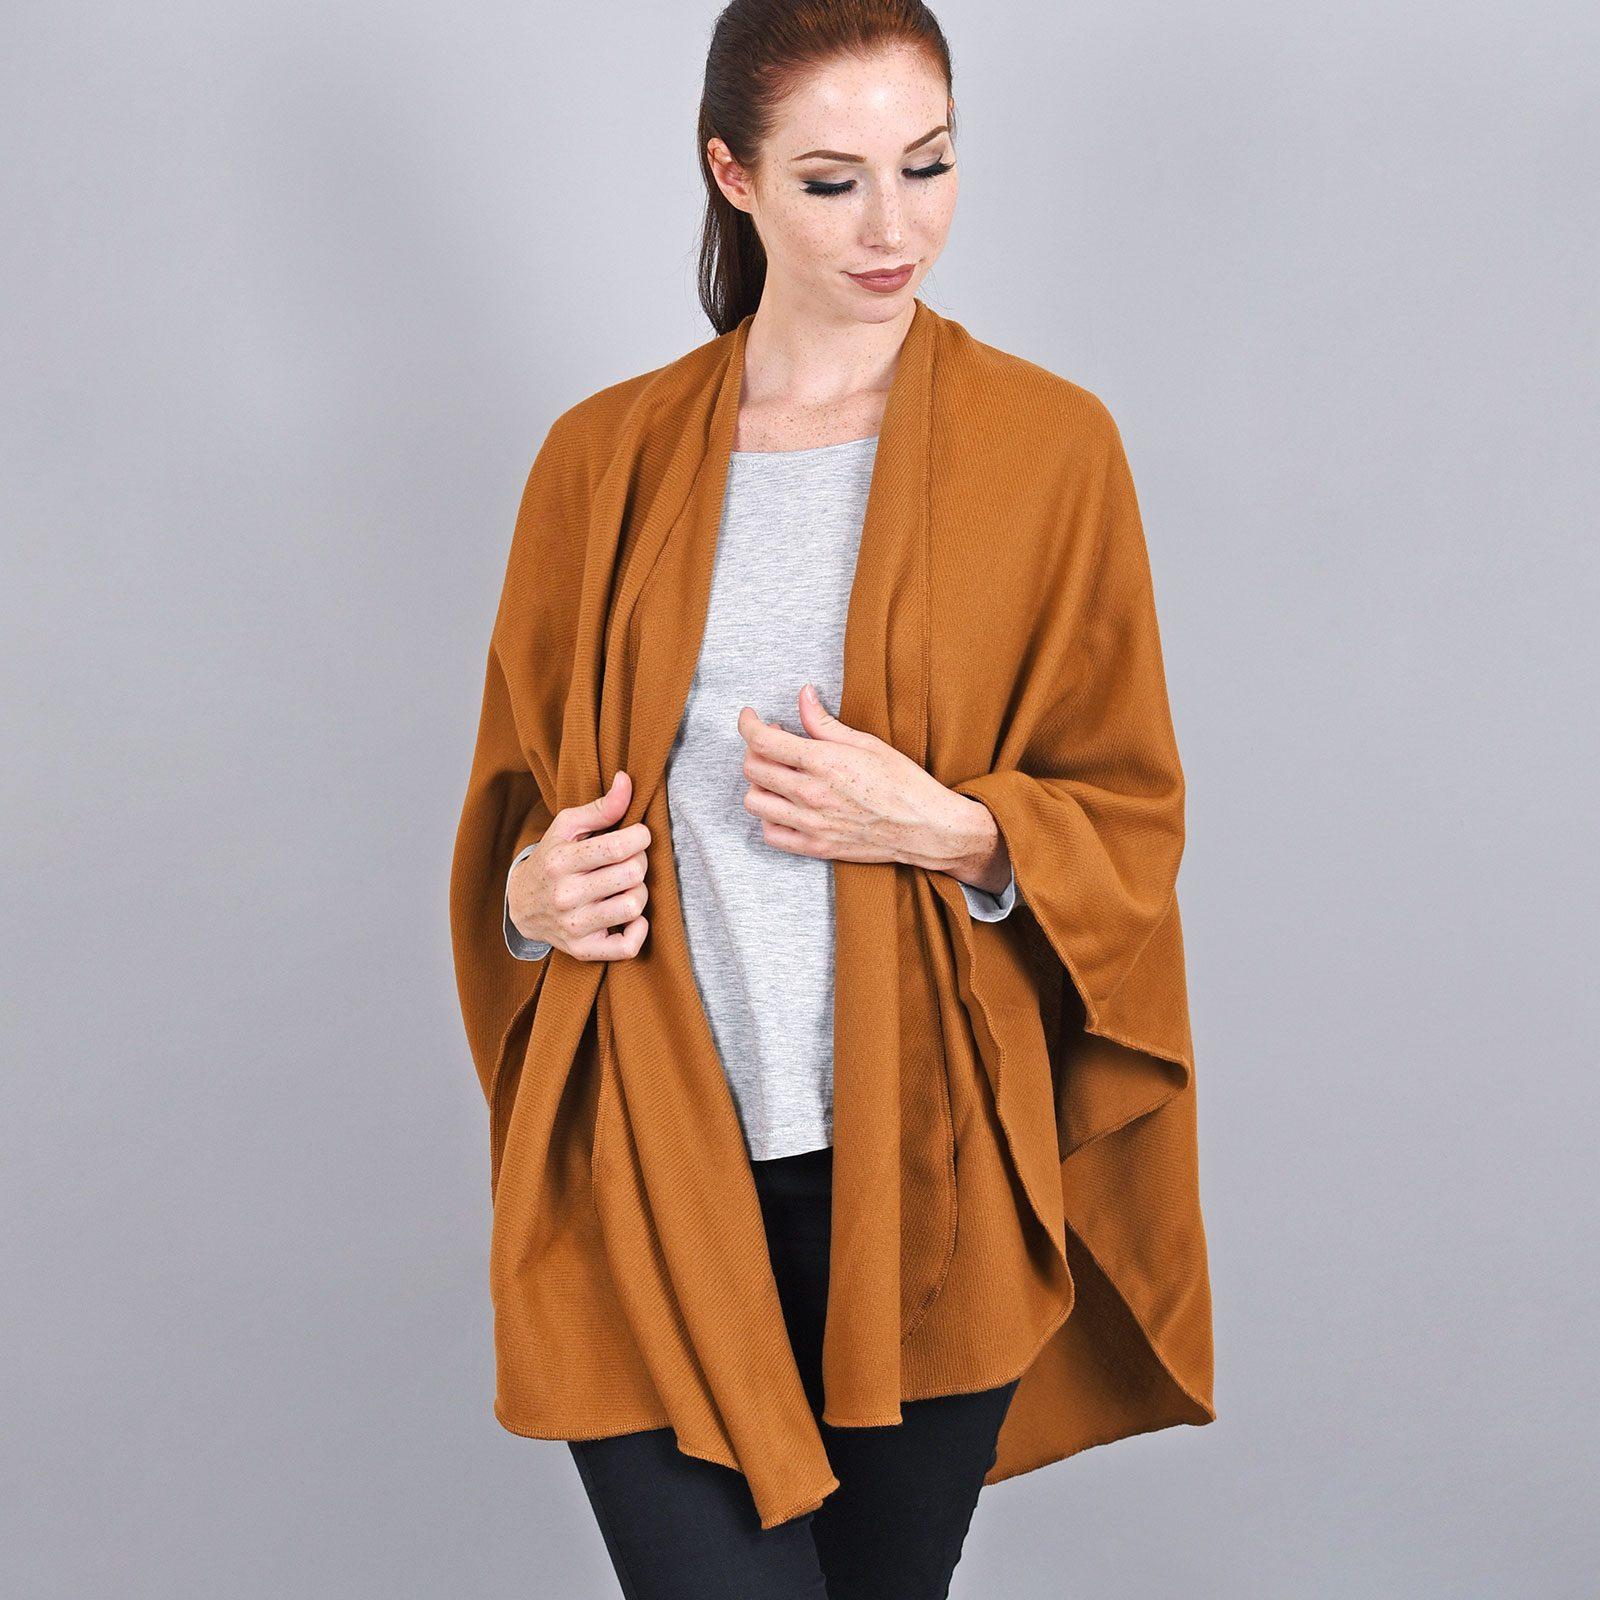 http://lookbook.allee-du-foulard.fr/wp-content/uploads/2019/01/AT-03256-VF16-poncho-rond-fabrique-en-france-marron-ocre-1600x1600.jpg